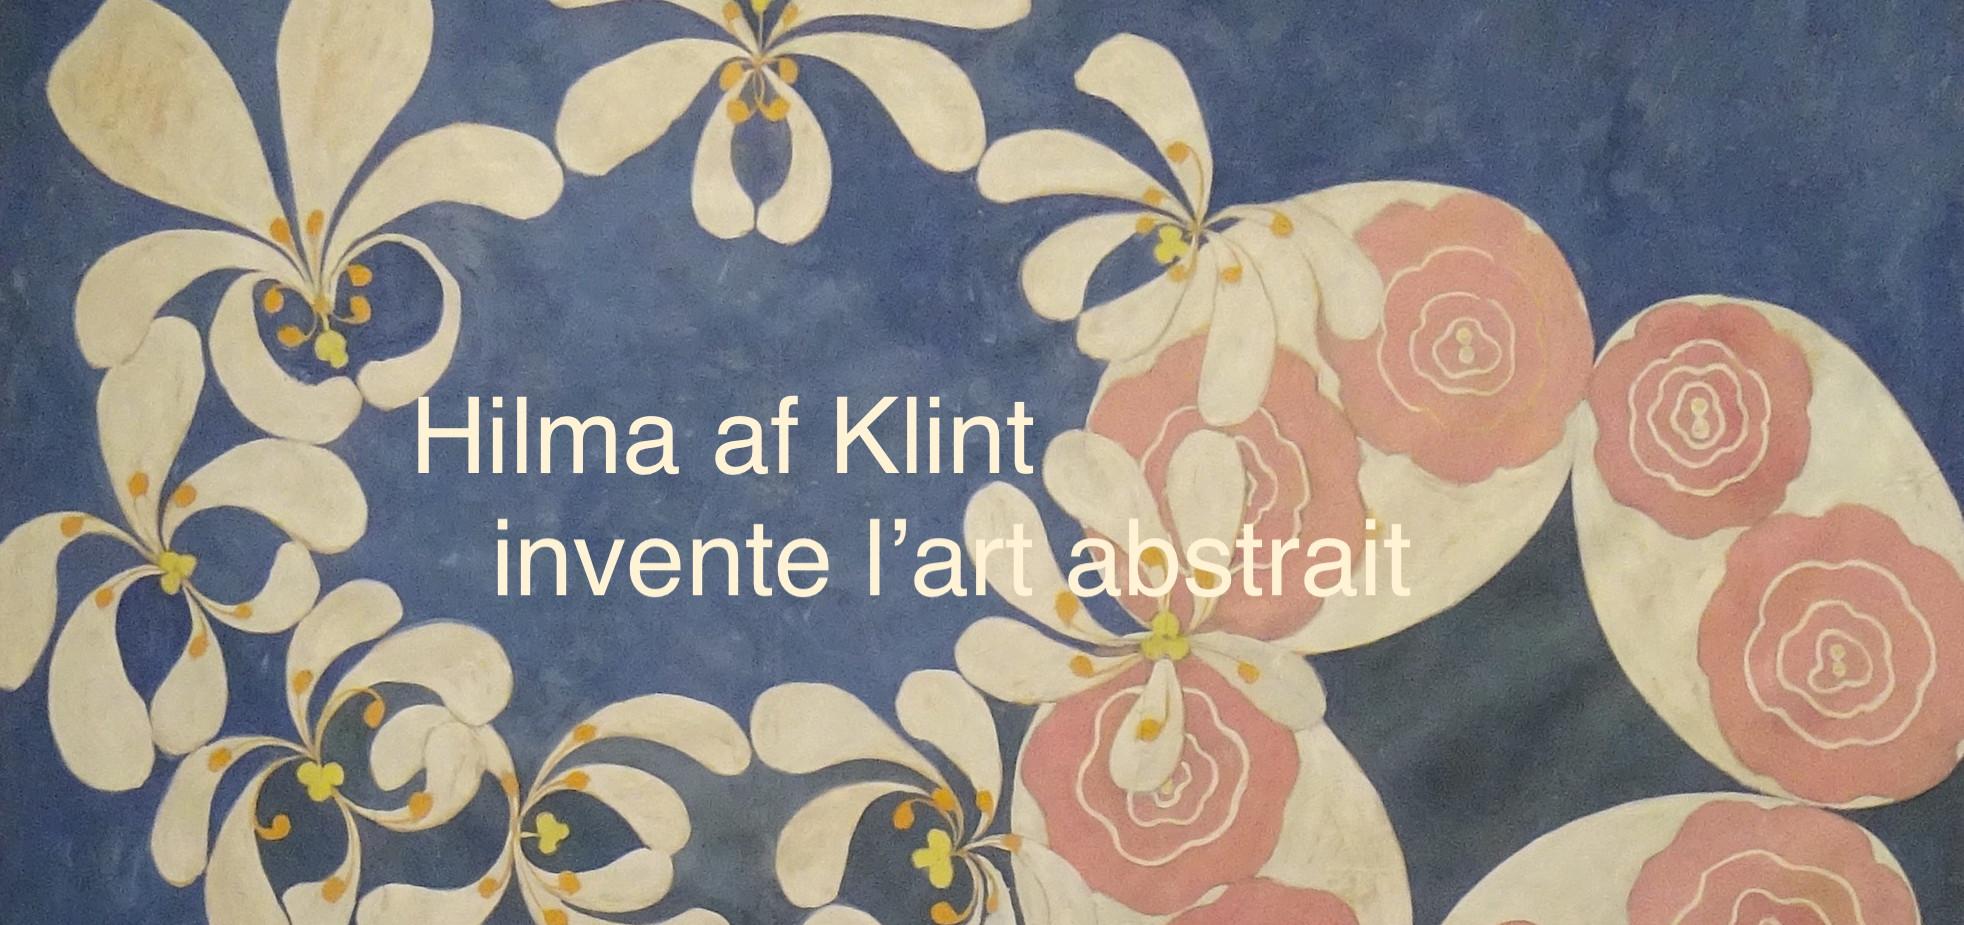 klint abstraction peinture suède invention